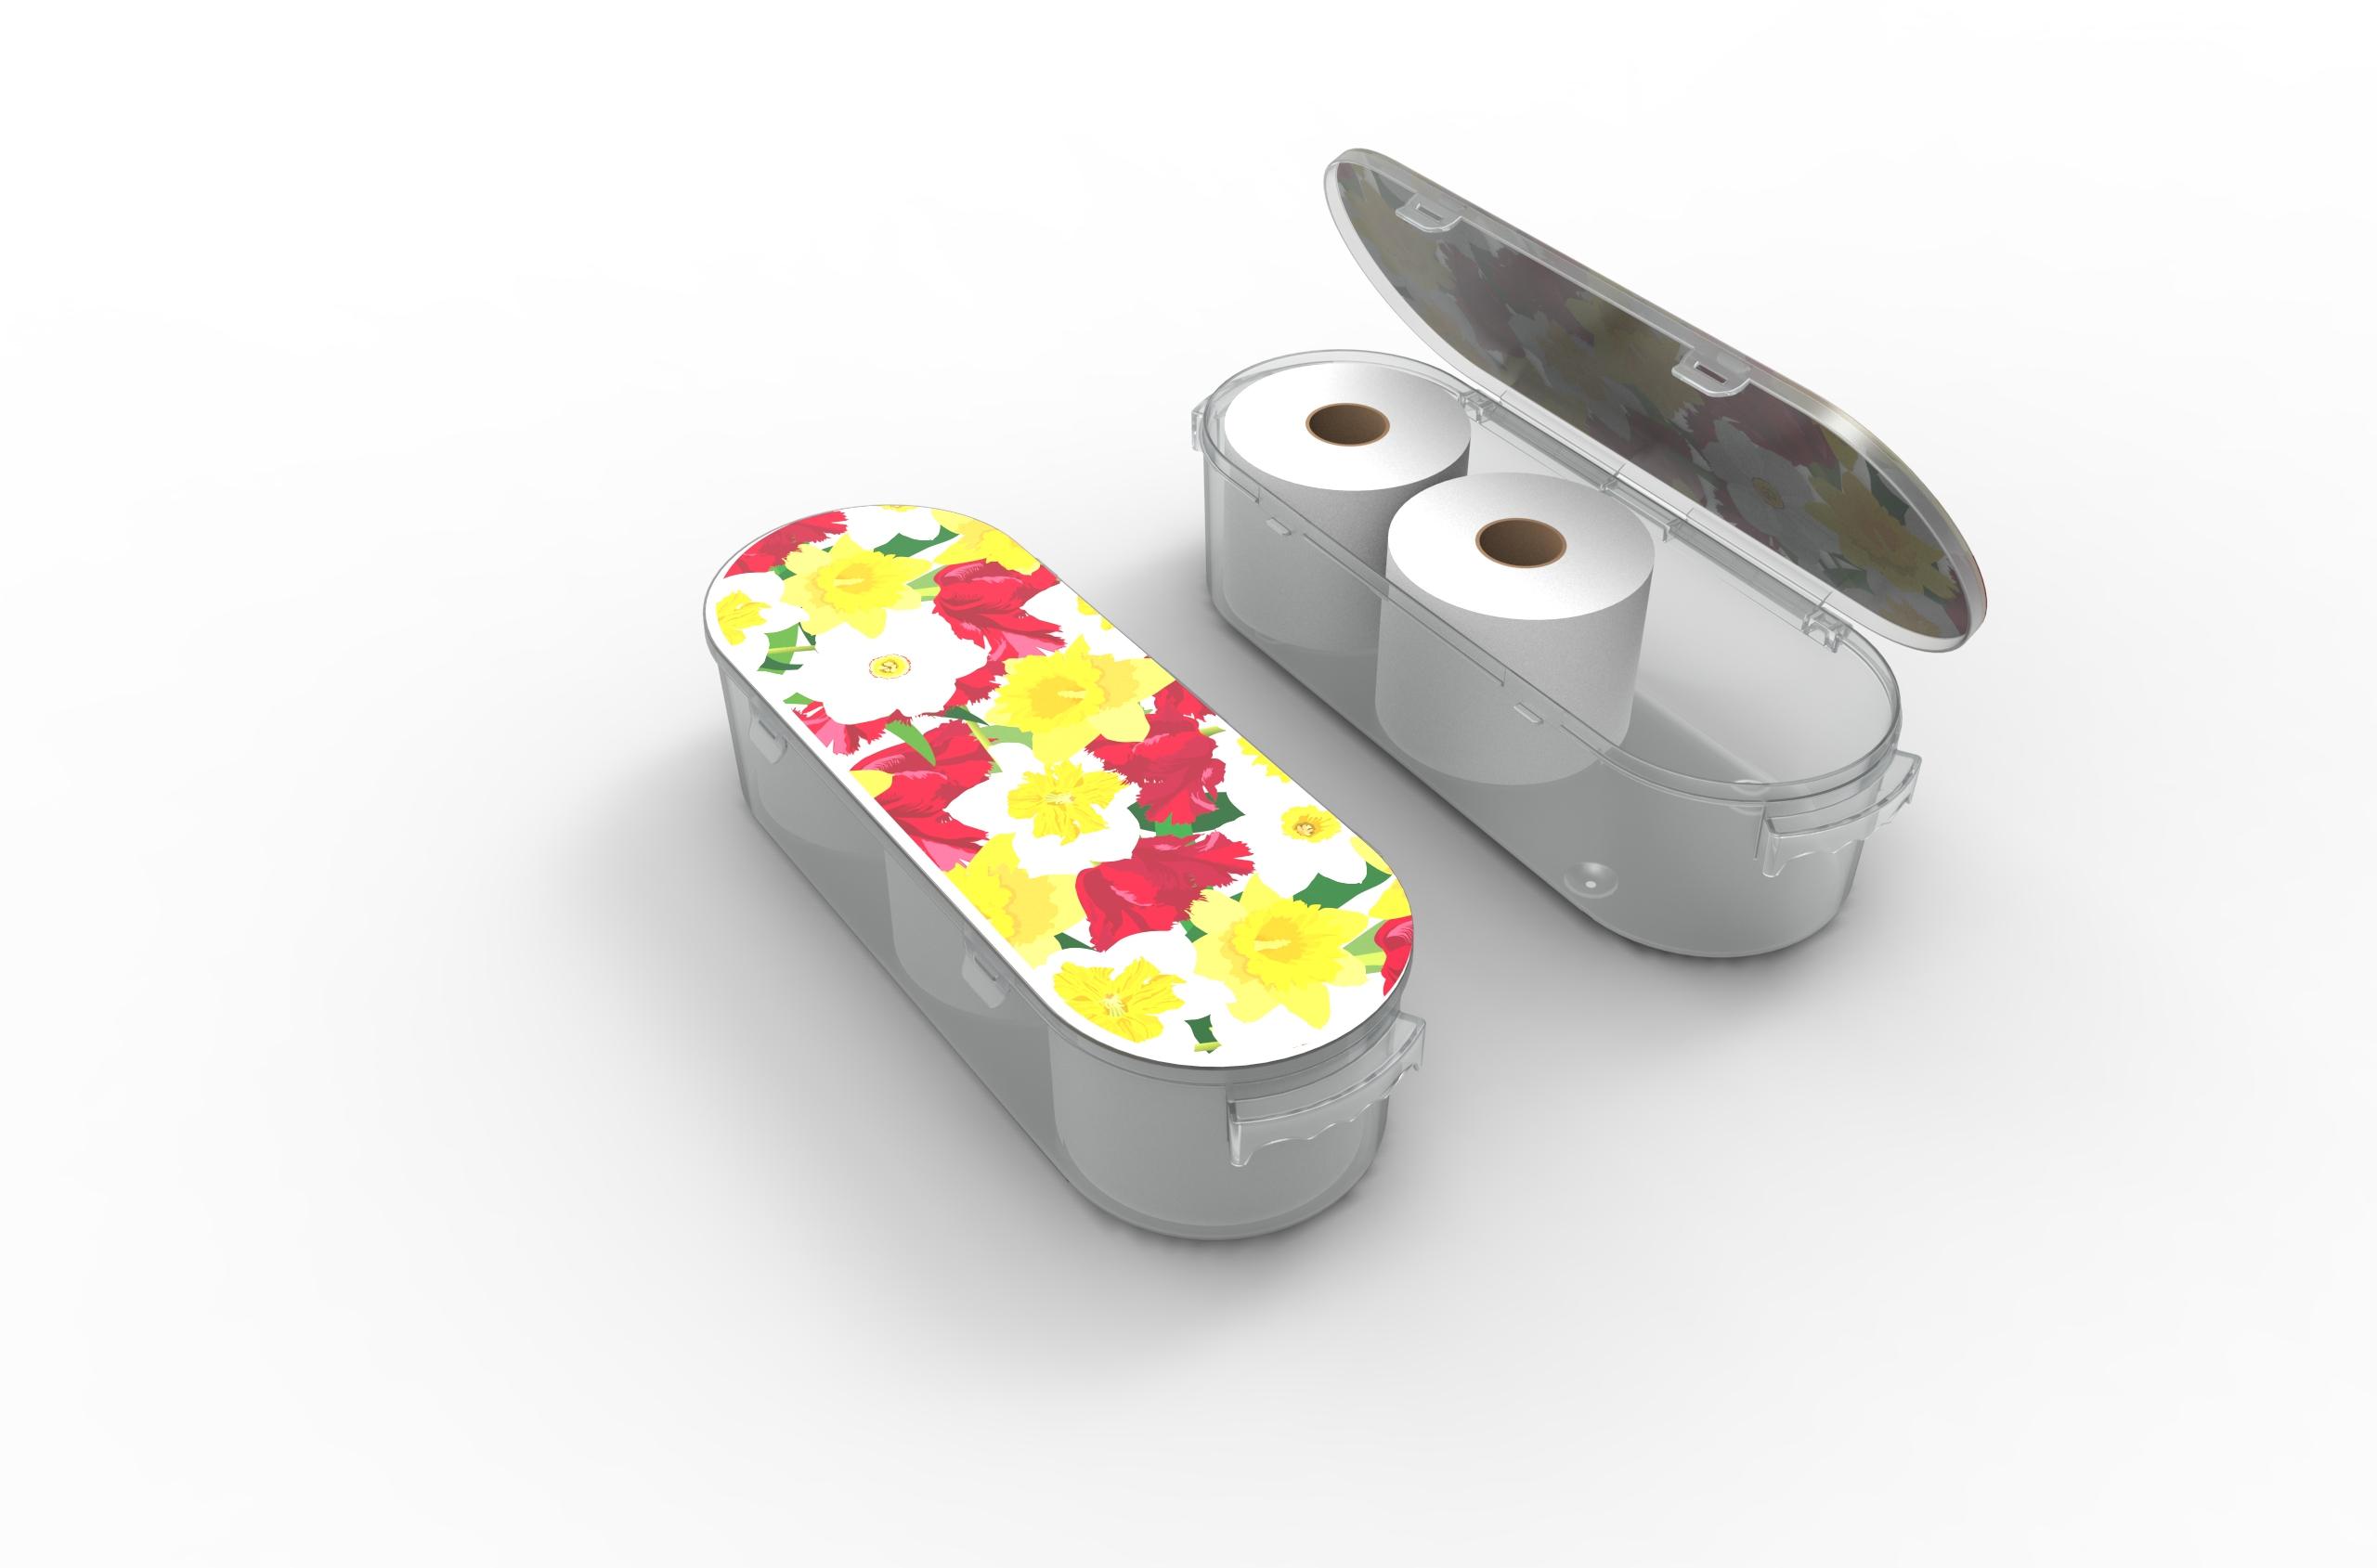 Nykia Designs Bathroom Toilet Paper Storage Solution - Flowers